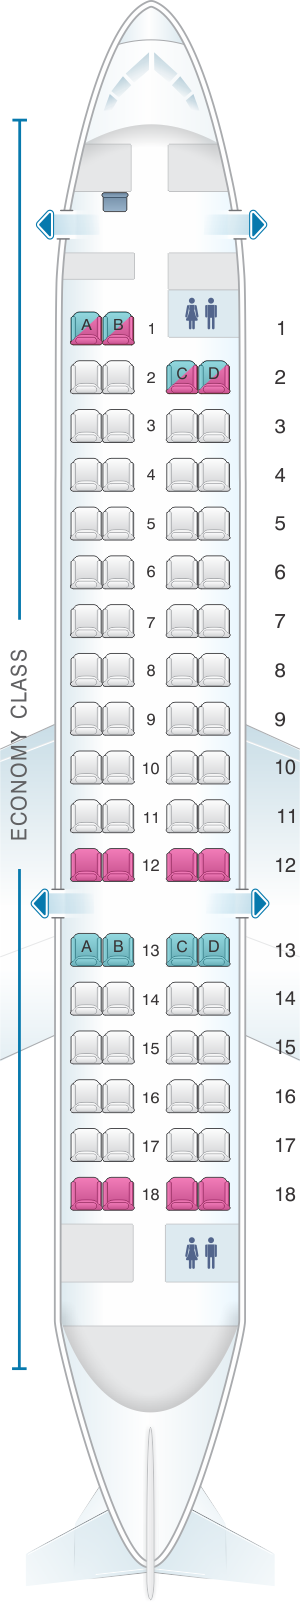 Seat map for Adria Airways Bombardier CRJ 700ER